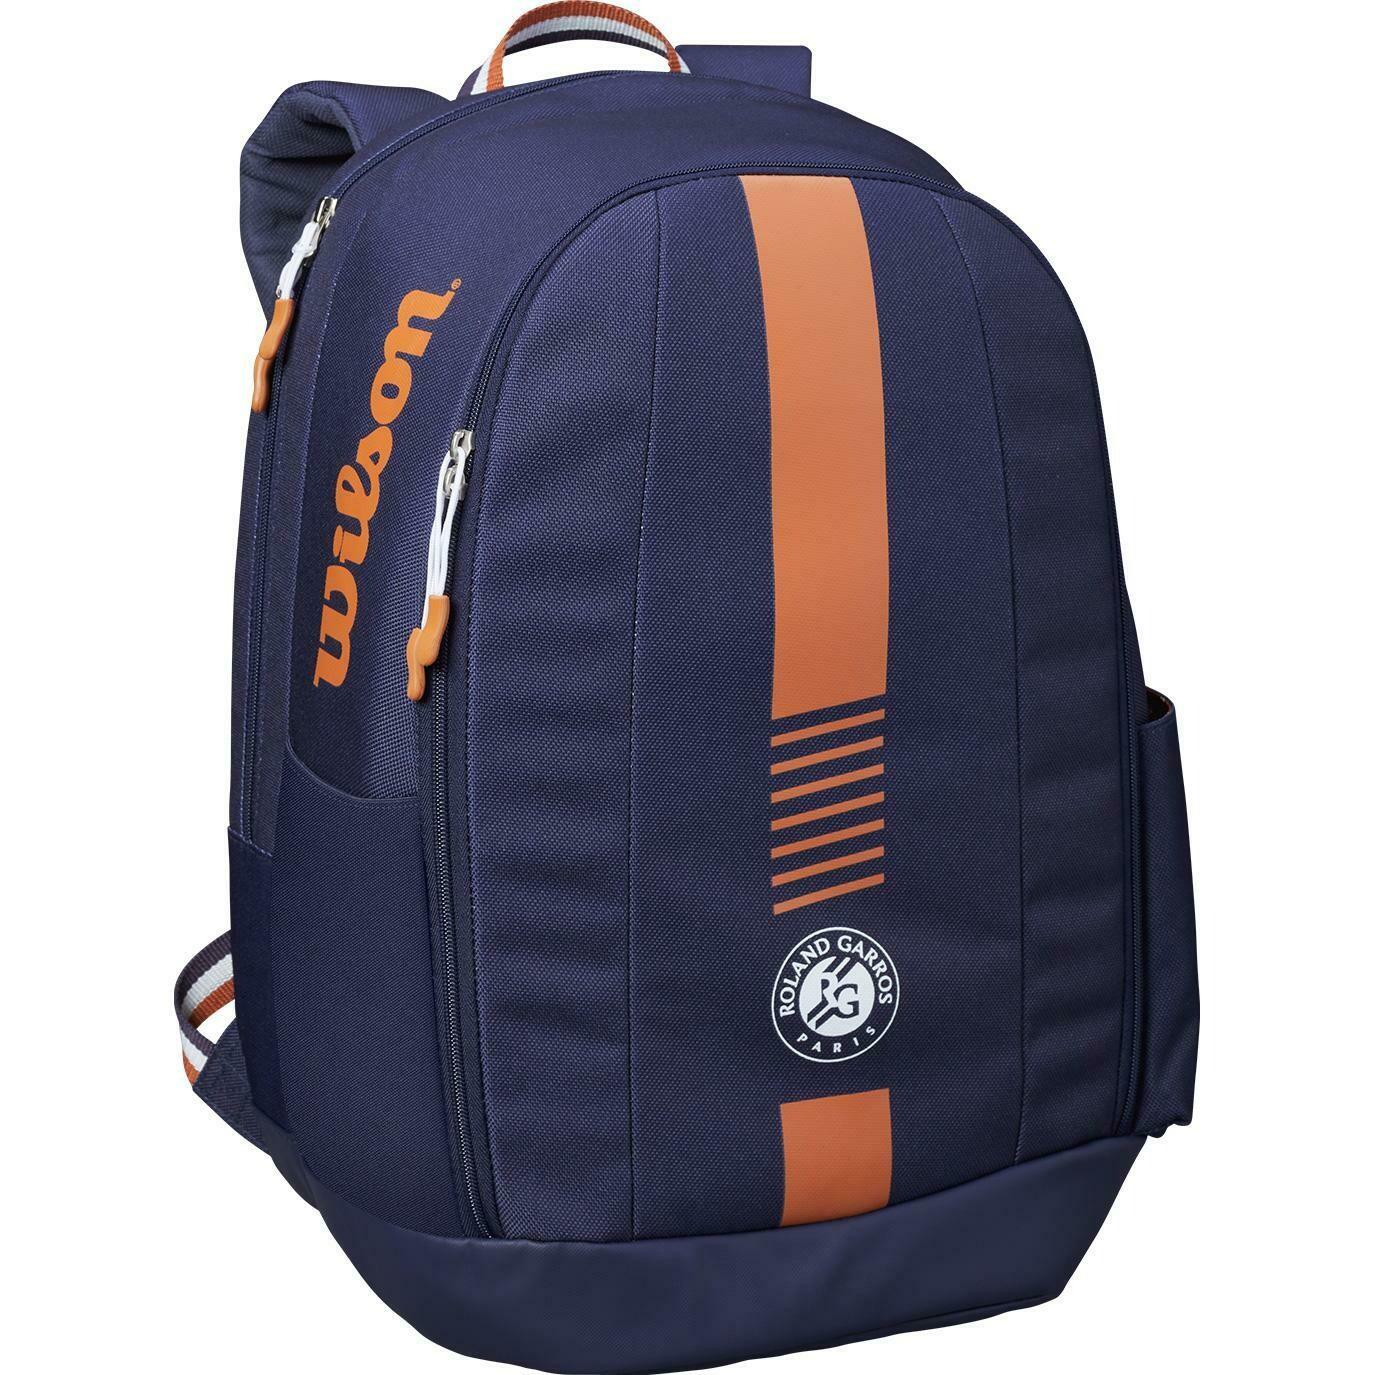 Wilson Roland Garros Team Backpack - Navy/Clay